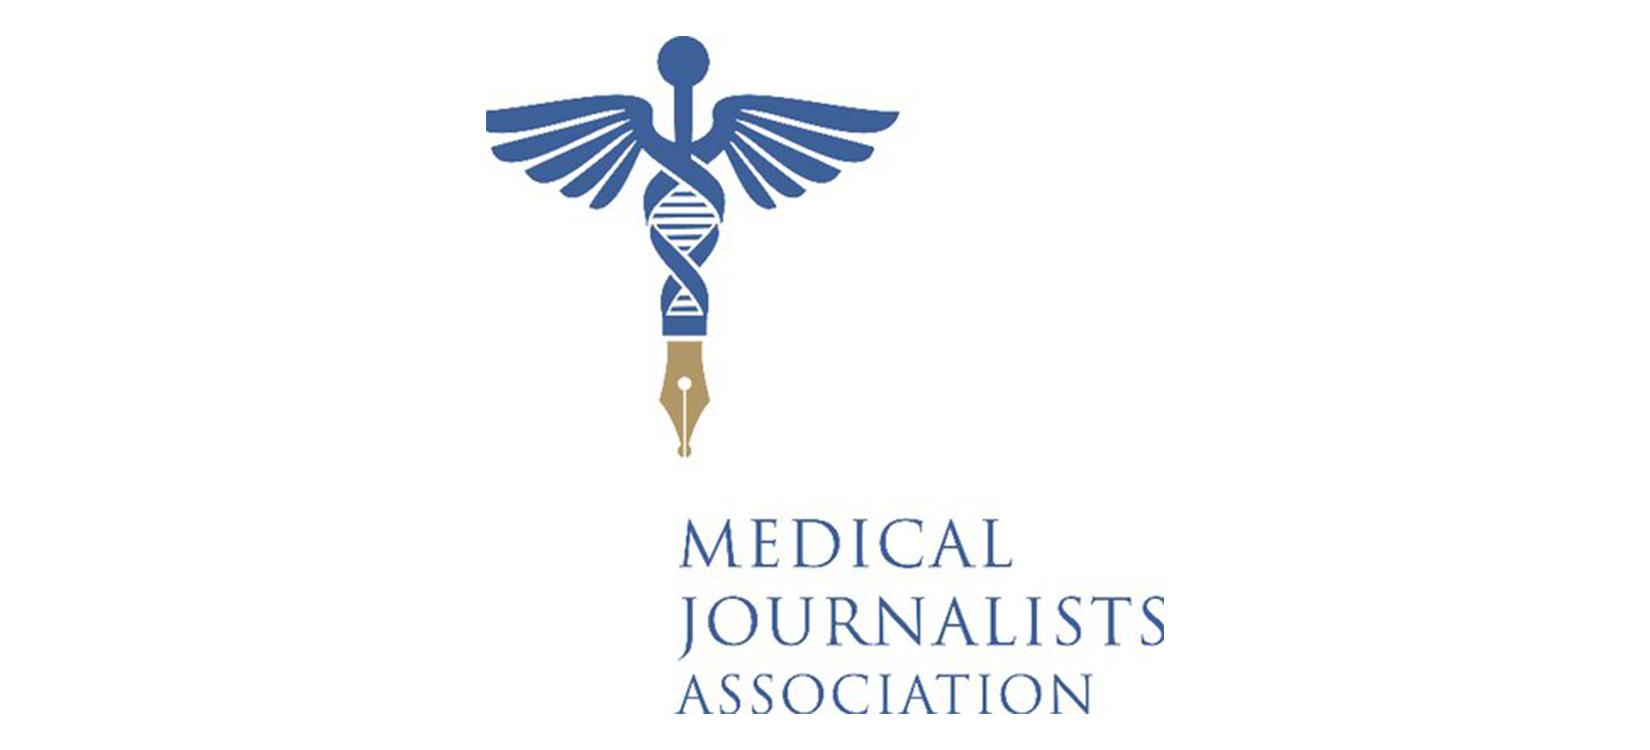 Medical Journalist Association Awards logo